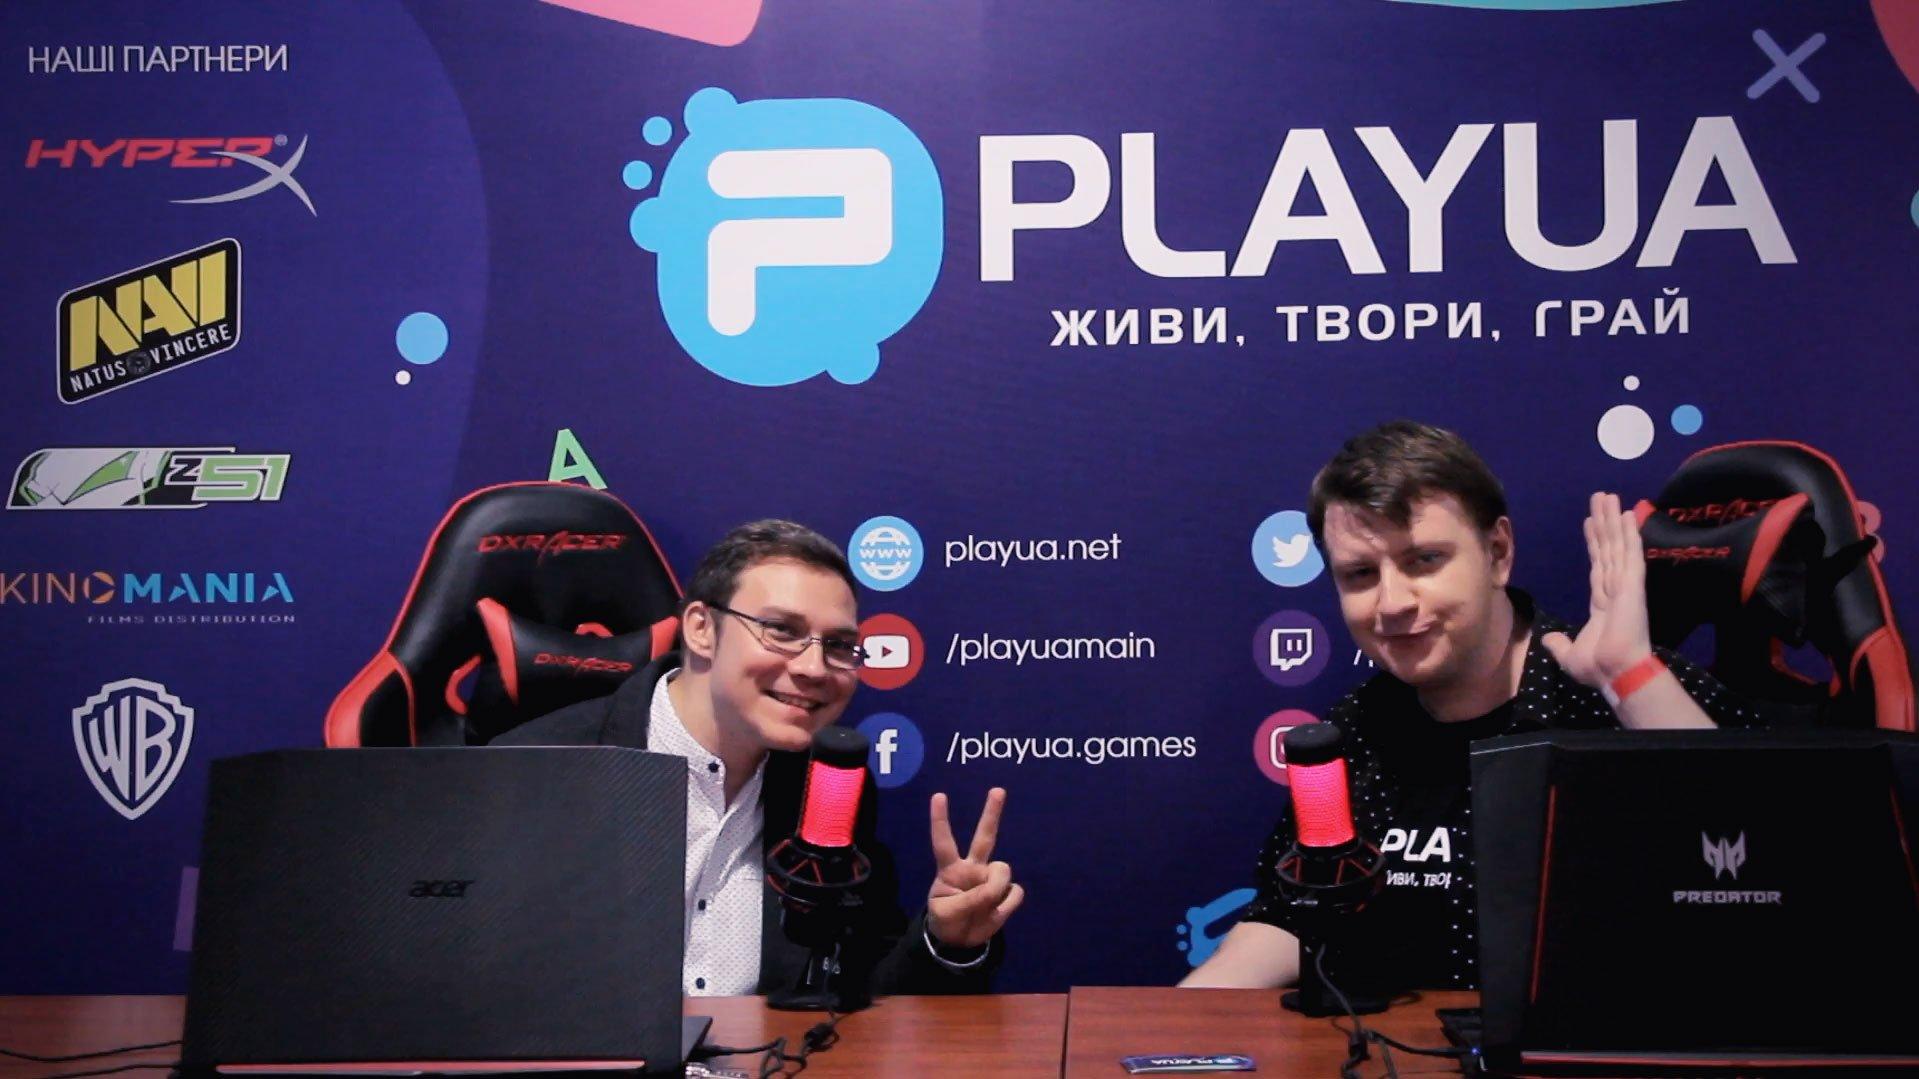 Gamesys. The Gaming Kyiv / Інтерв'ю з Олександром Дученчуком (Comic Con Ukraine 2018)